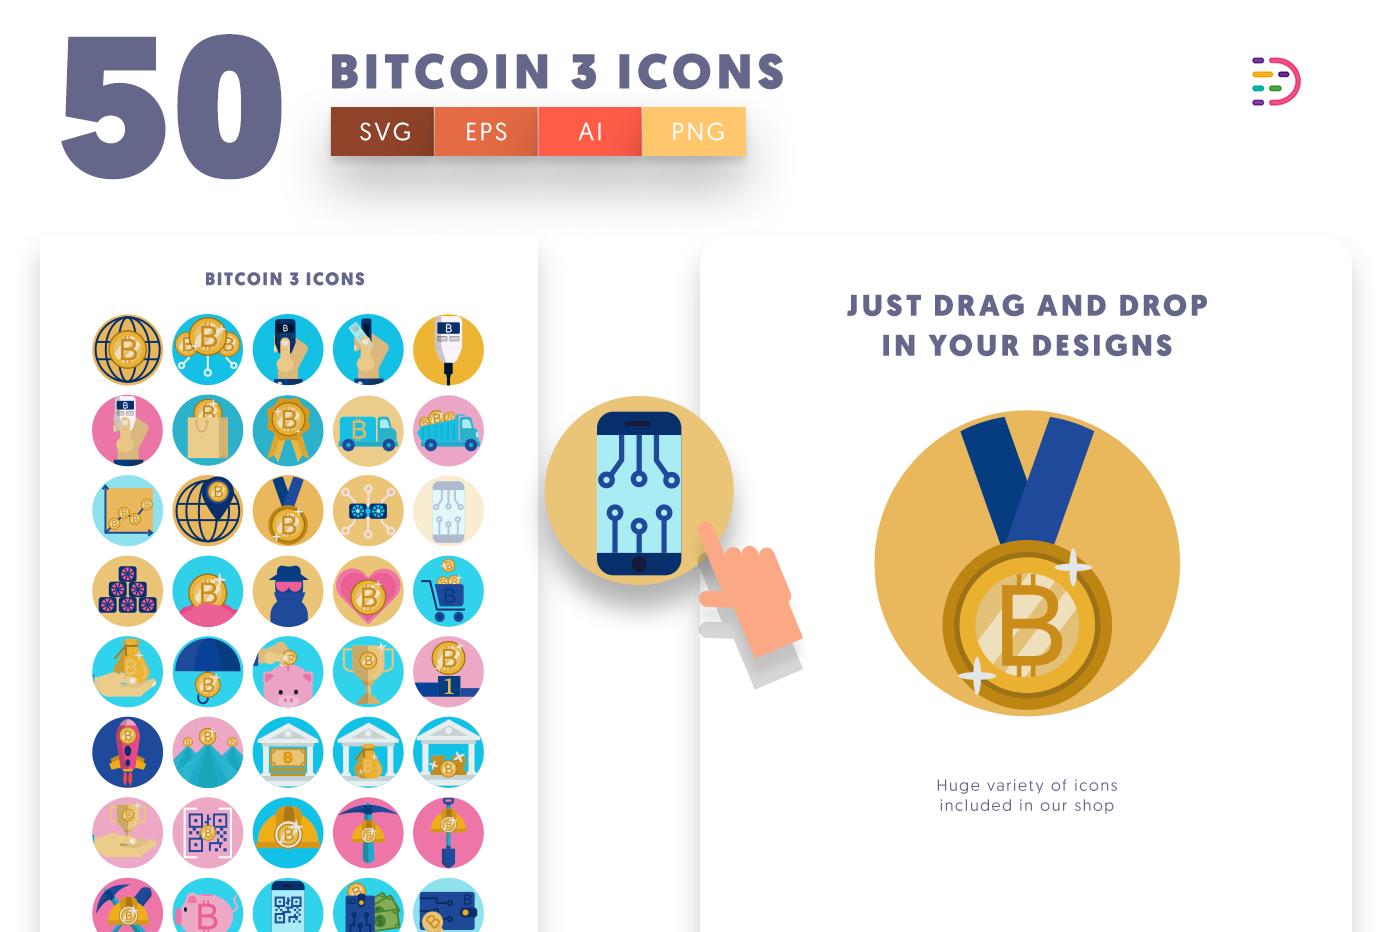 Drag and drop vector 50 Bitcoin 3 Icons